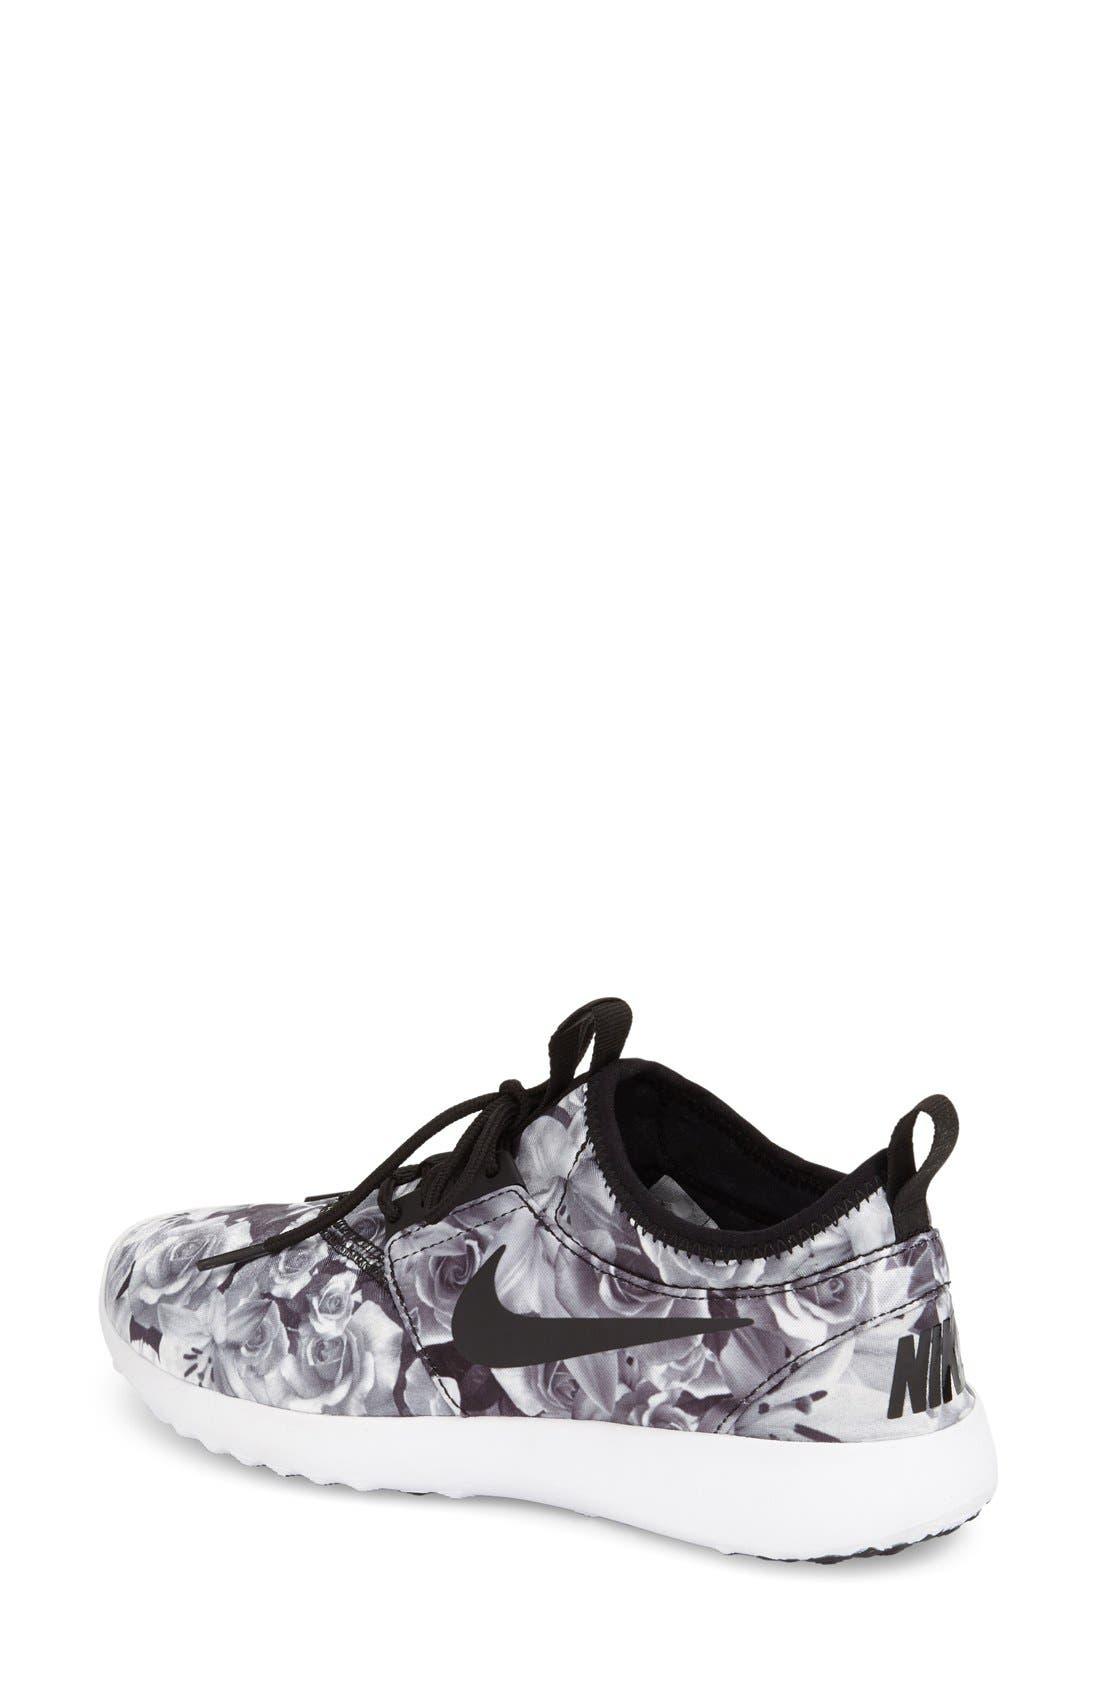 Juvenate Sneaker,                             Alternate thumbnail 4, color,                             Black/ Black/ White